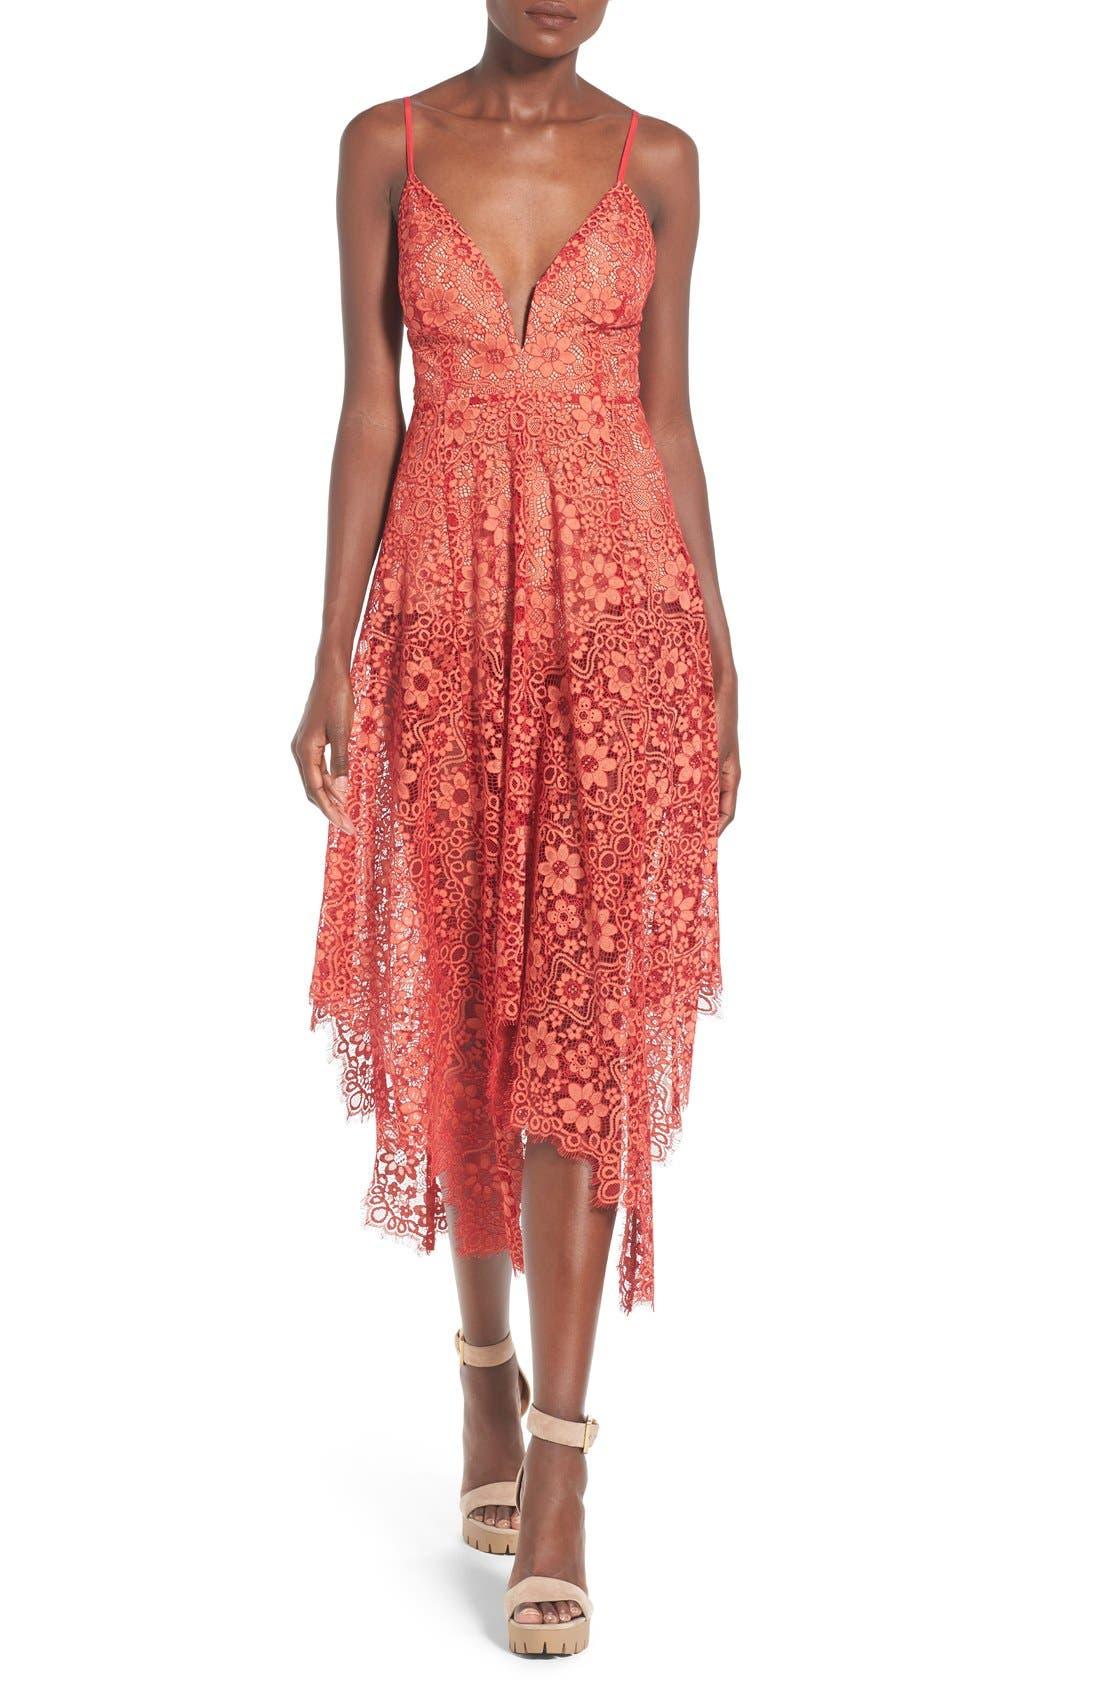 Main Image - For Love & Lemons 'Rosemary' Handkerchief Hem Lace Midi Dress